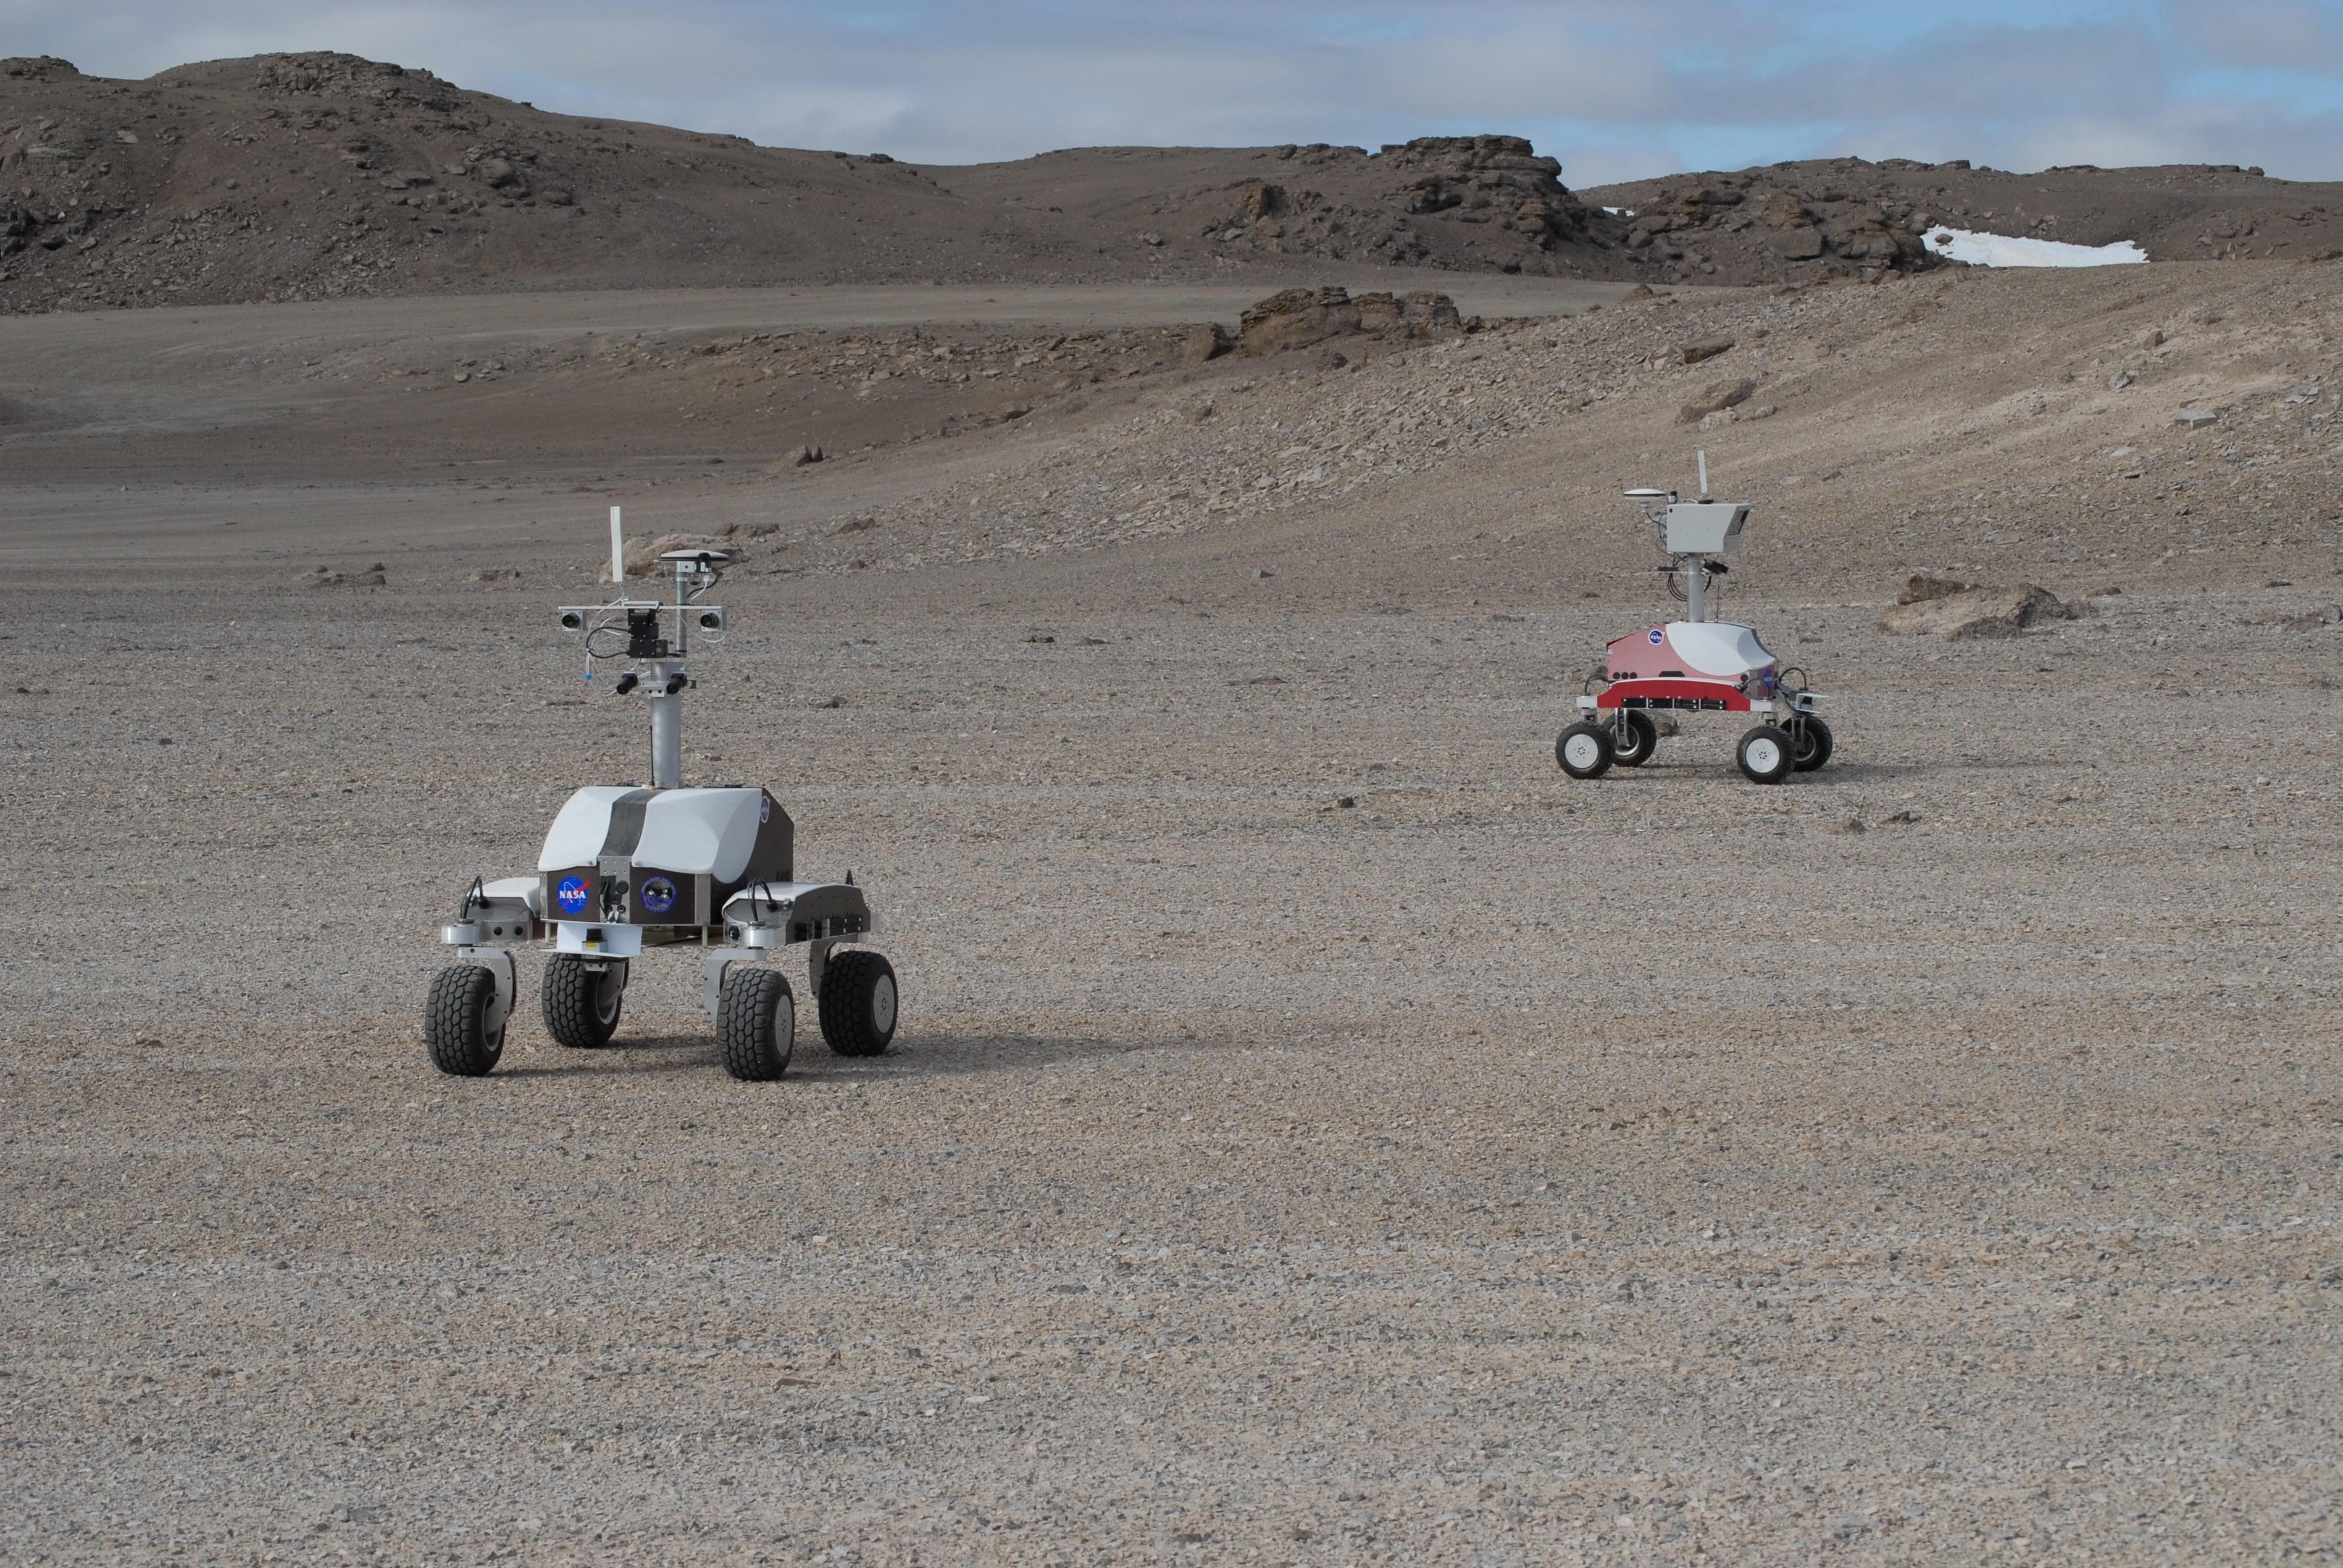 mars rover q5 - photo #14